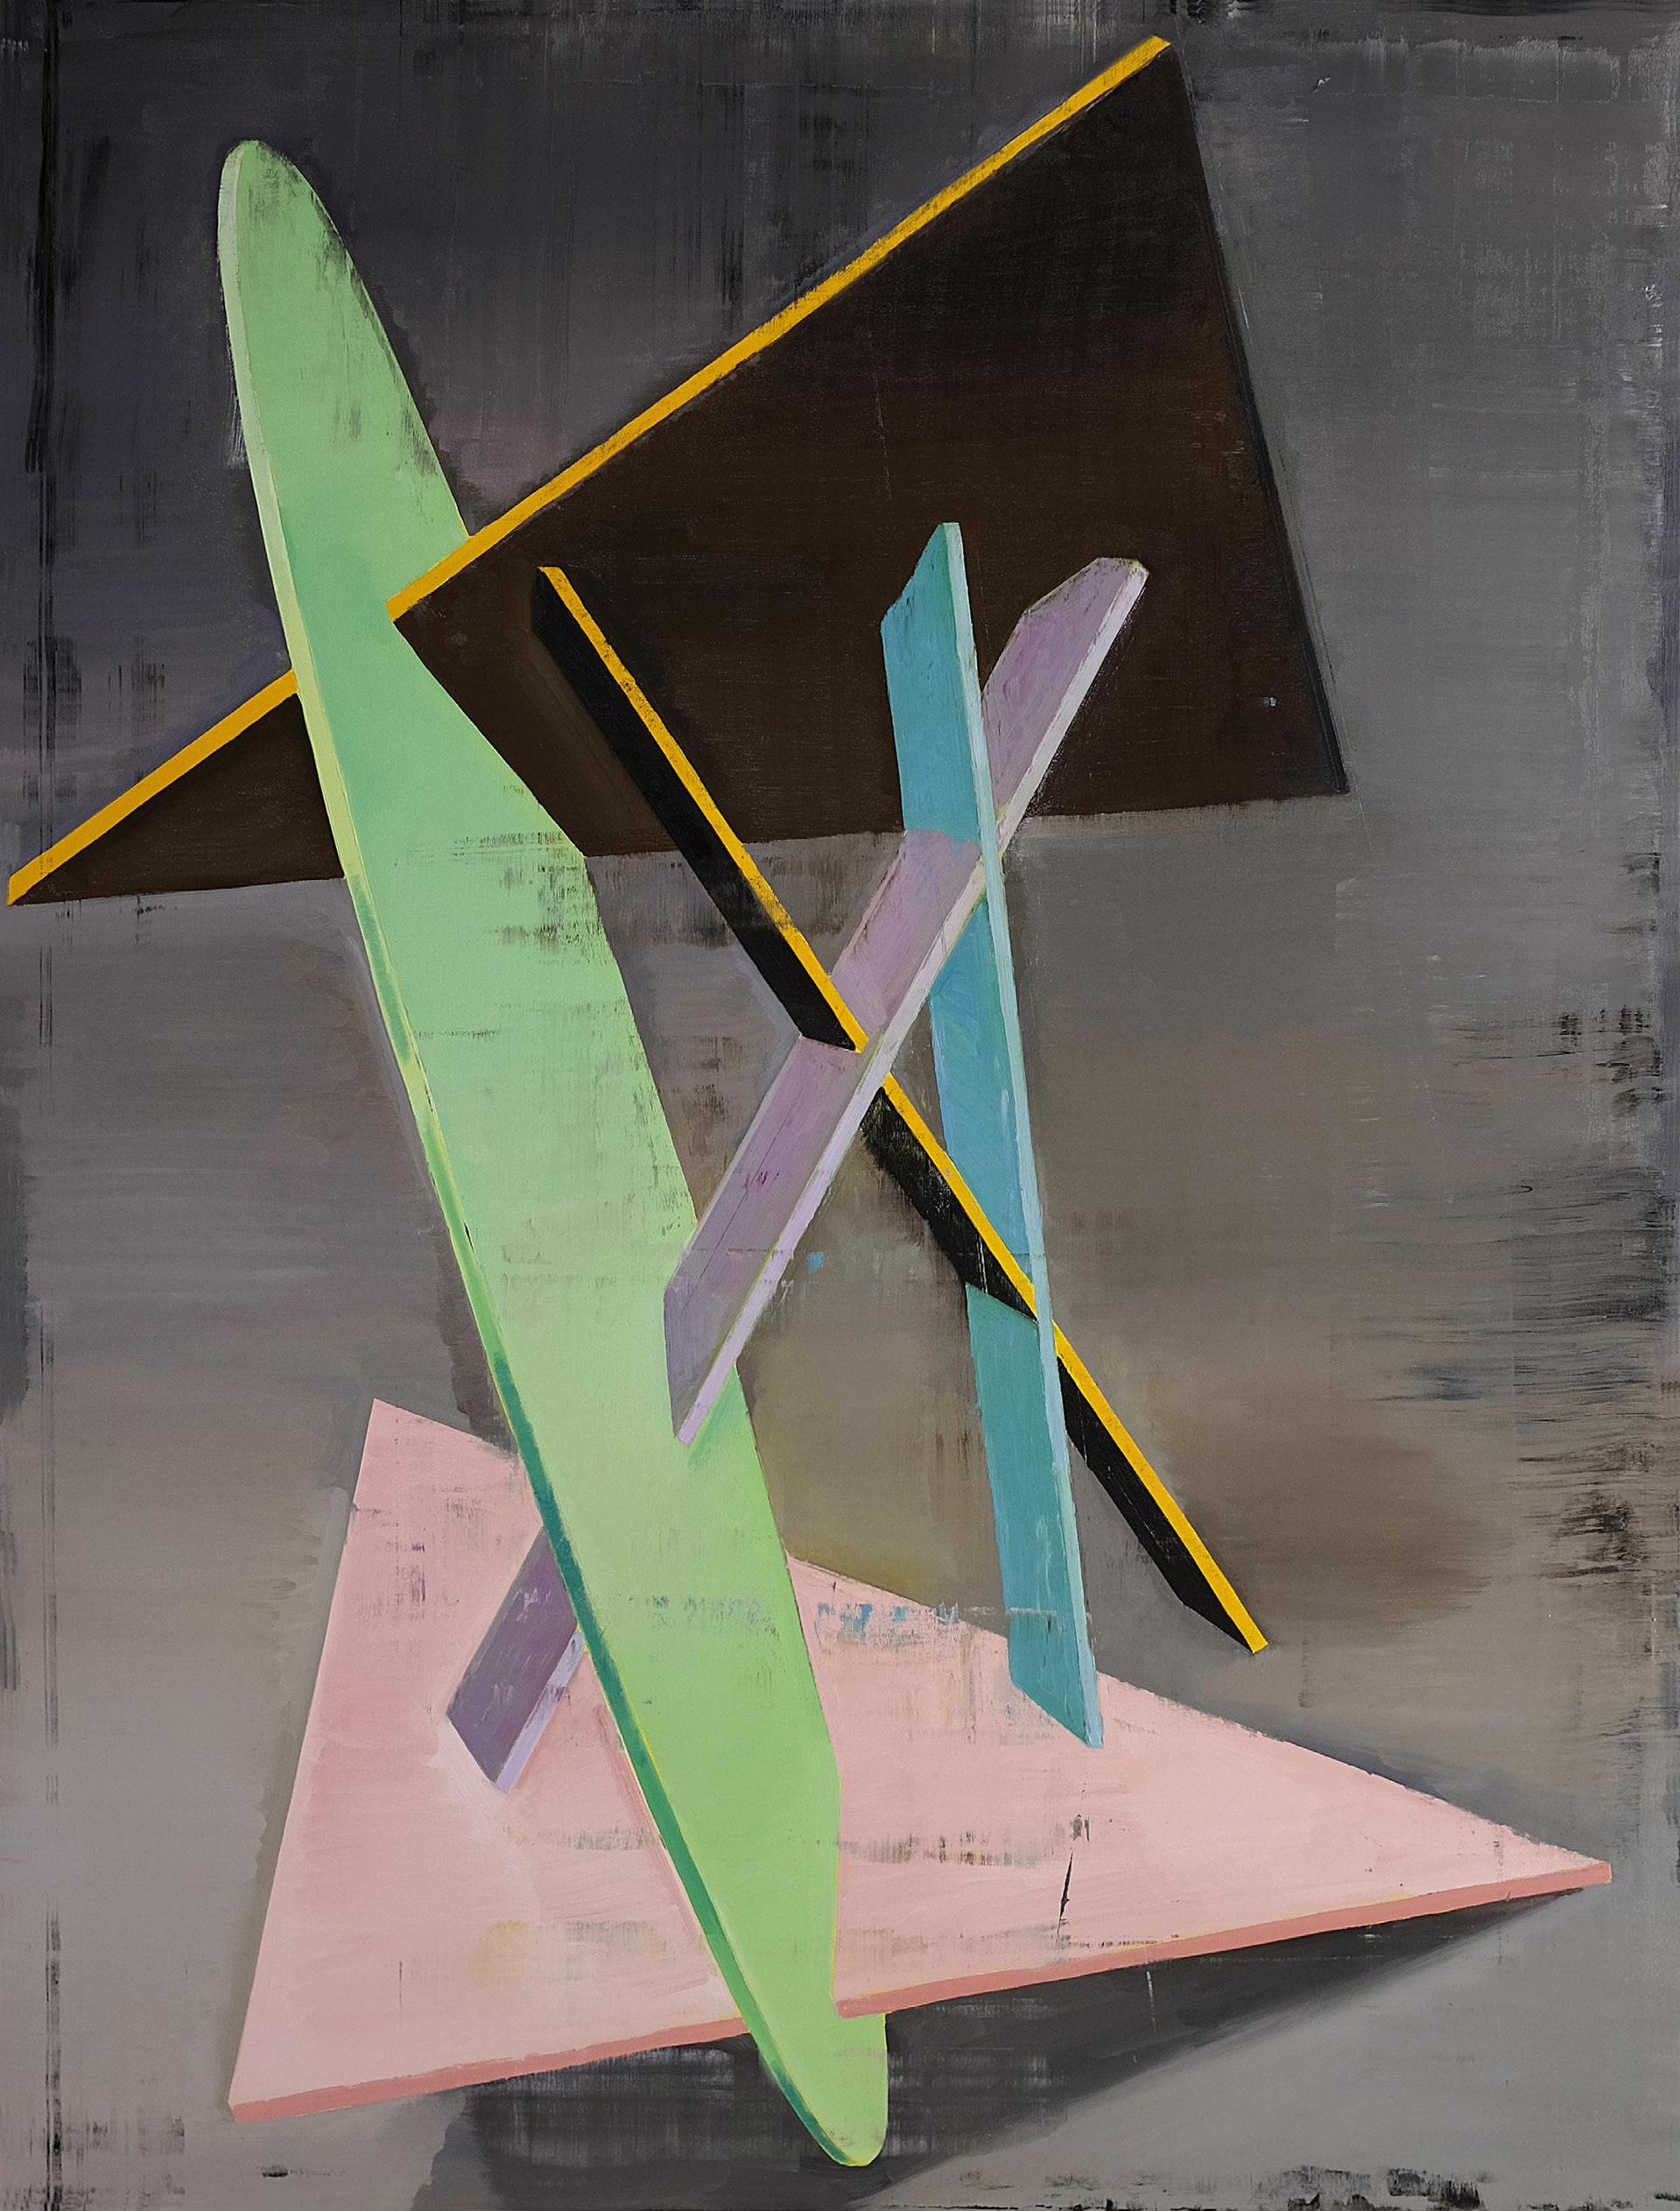 Genti Korini: Structure Nr. 4. 2018